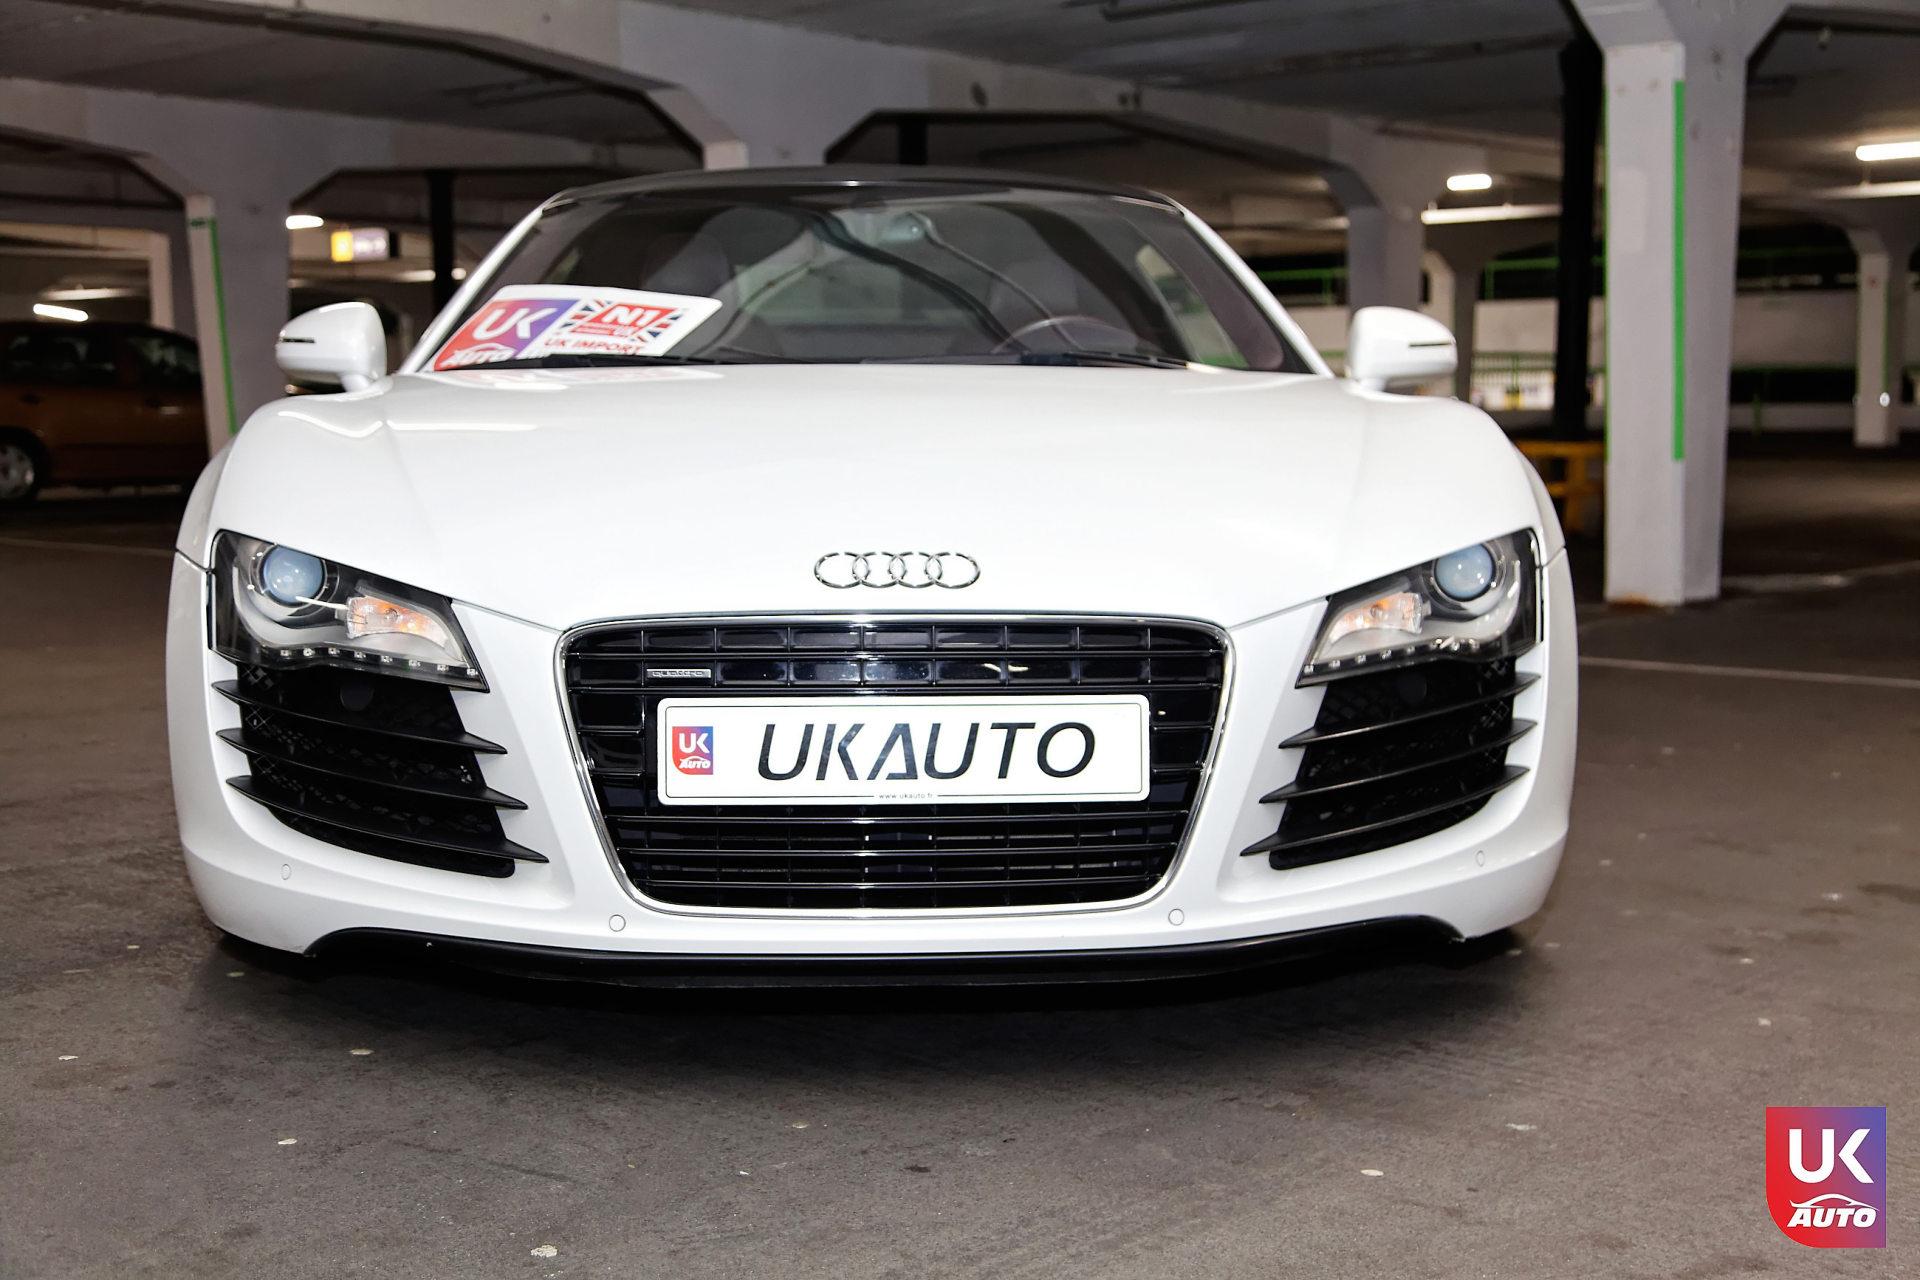 Audi R8 Import audi r8 lhd angleterre audi R8 V8 TFSI AUDI uk importation audi LHD volant a gauche5 DxO - AUDI R8 ANGLETERRE IMPORTATION AUDI R8 UK IMPORT SUPERCAR FELICITATION A CHARLES POUR CET IMPORT